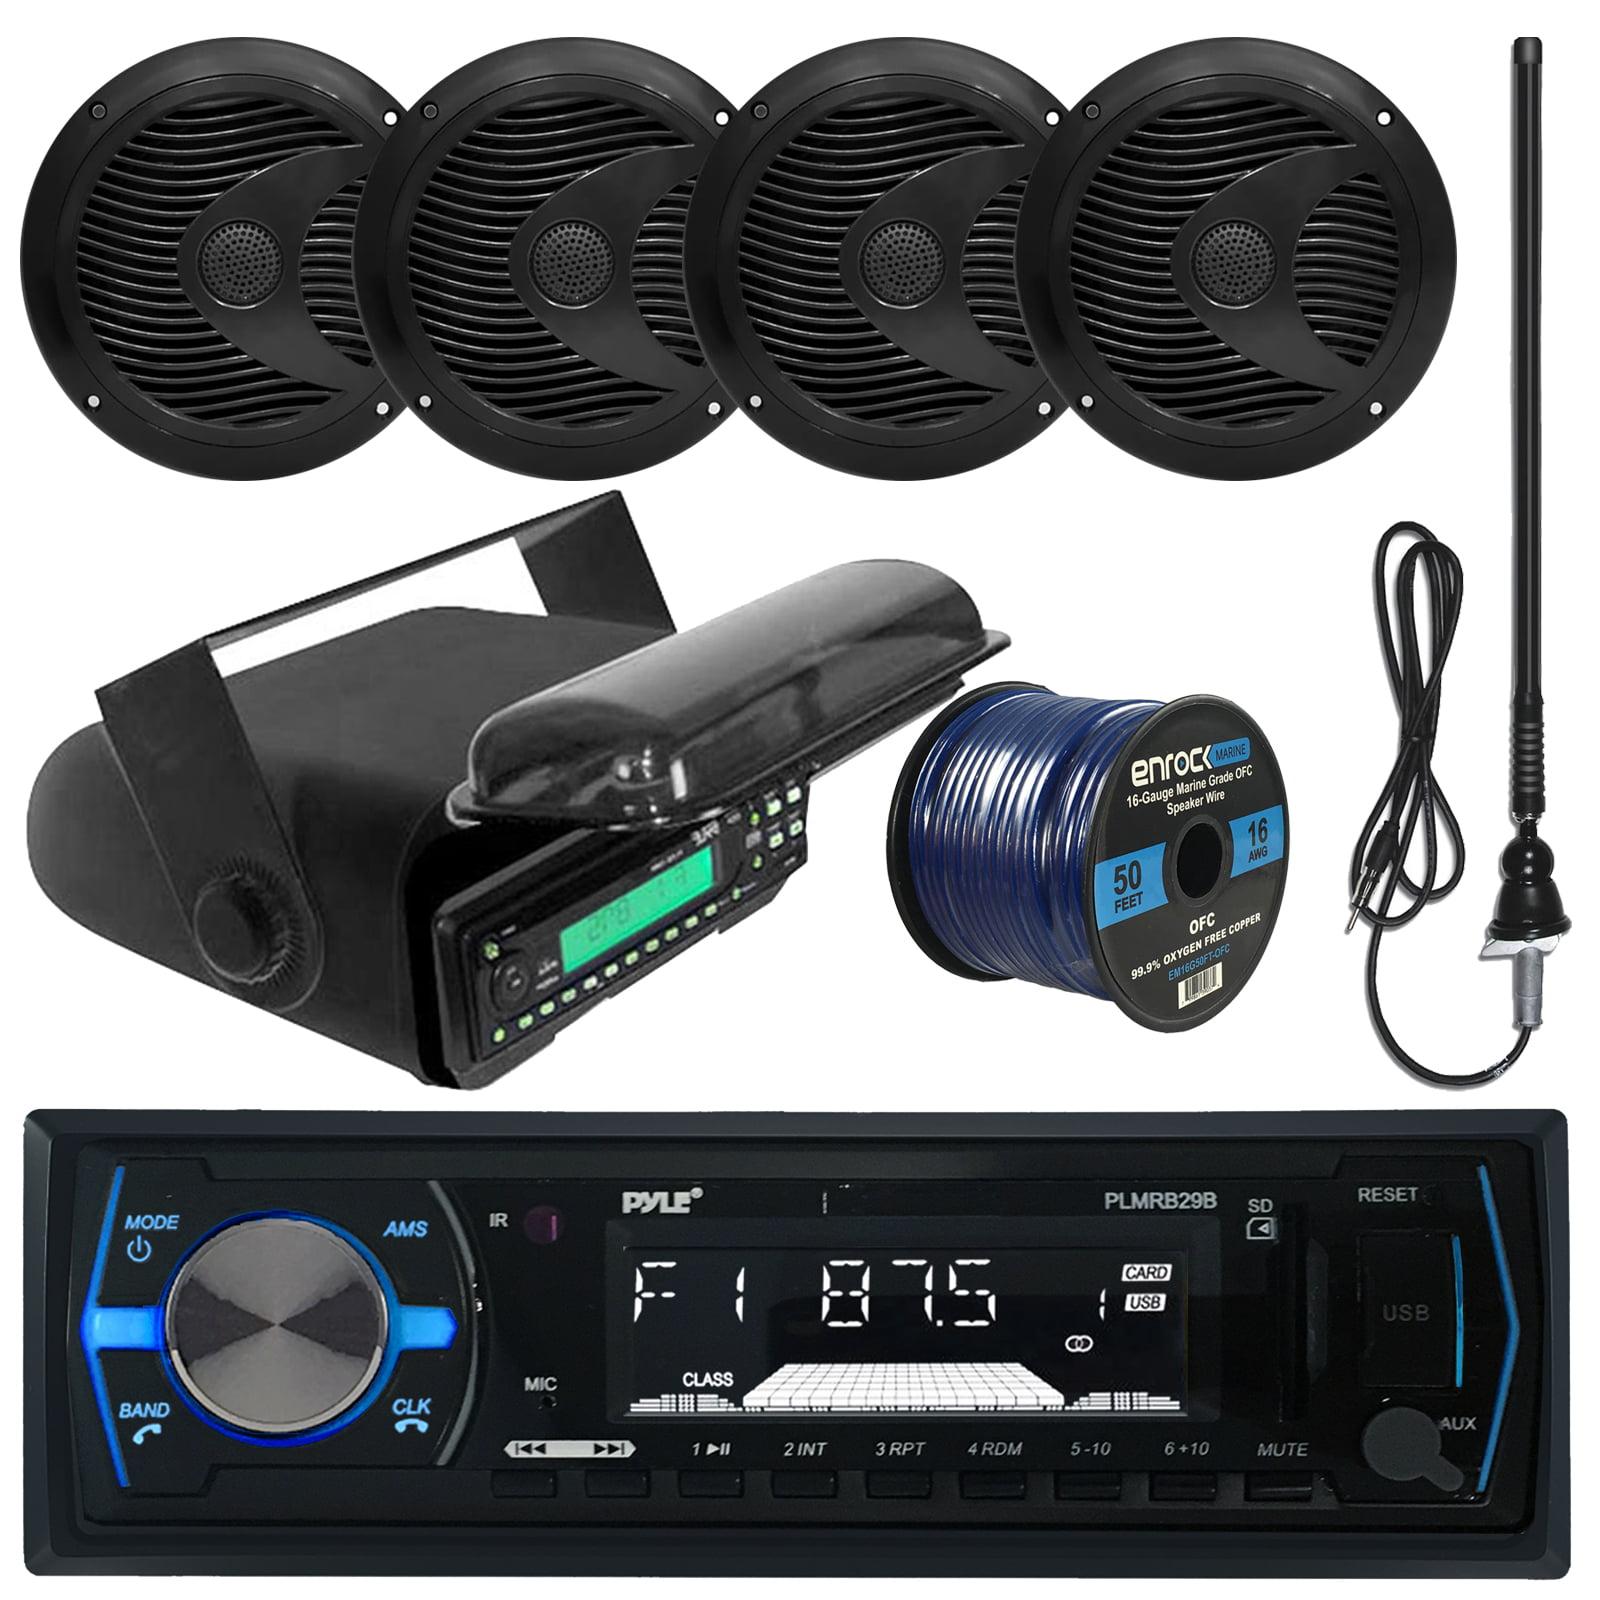 Pyle bluetooth speaker hose pinch